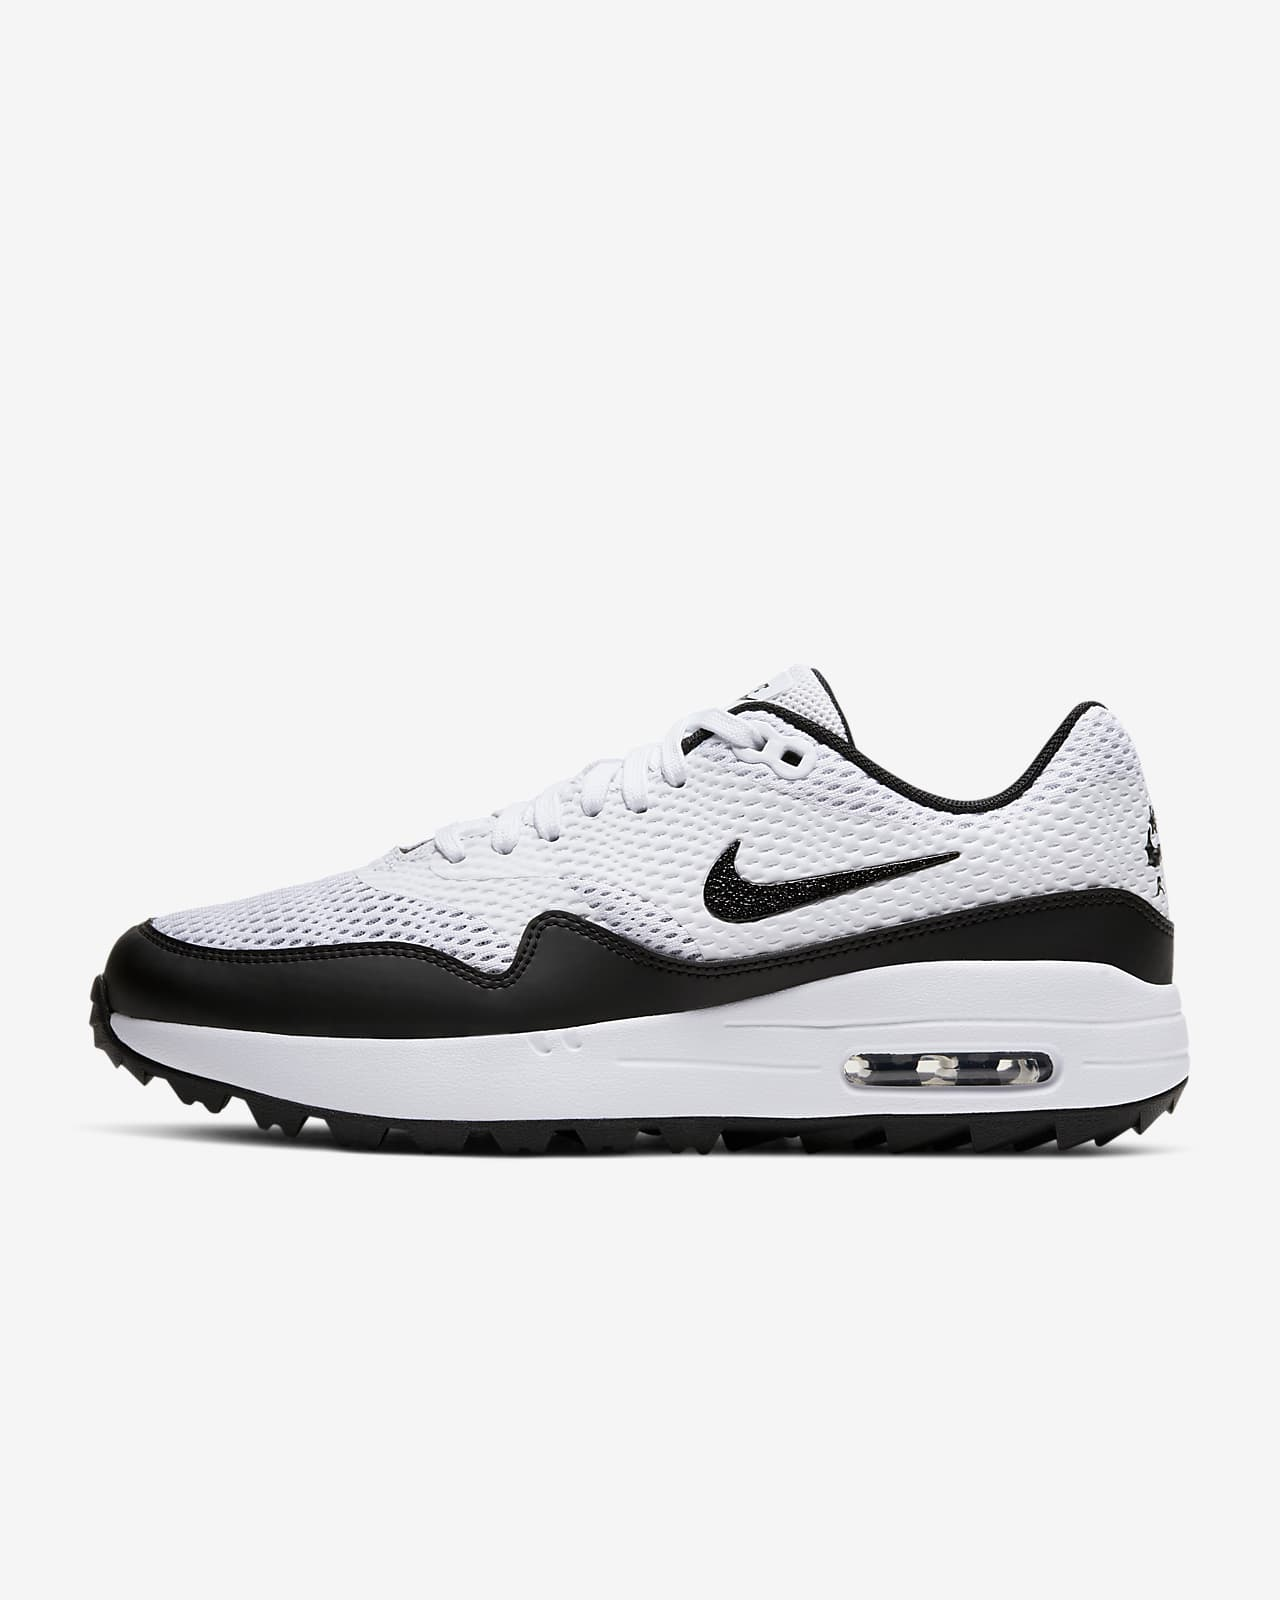 Nike Air Max 1 G Zapatillas de golf - Mujer